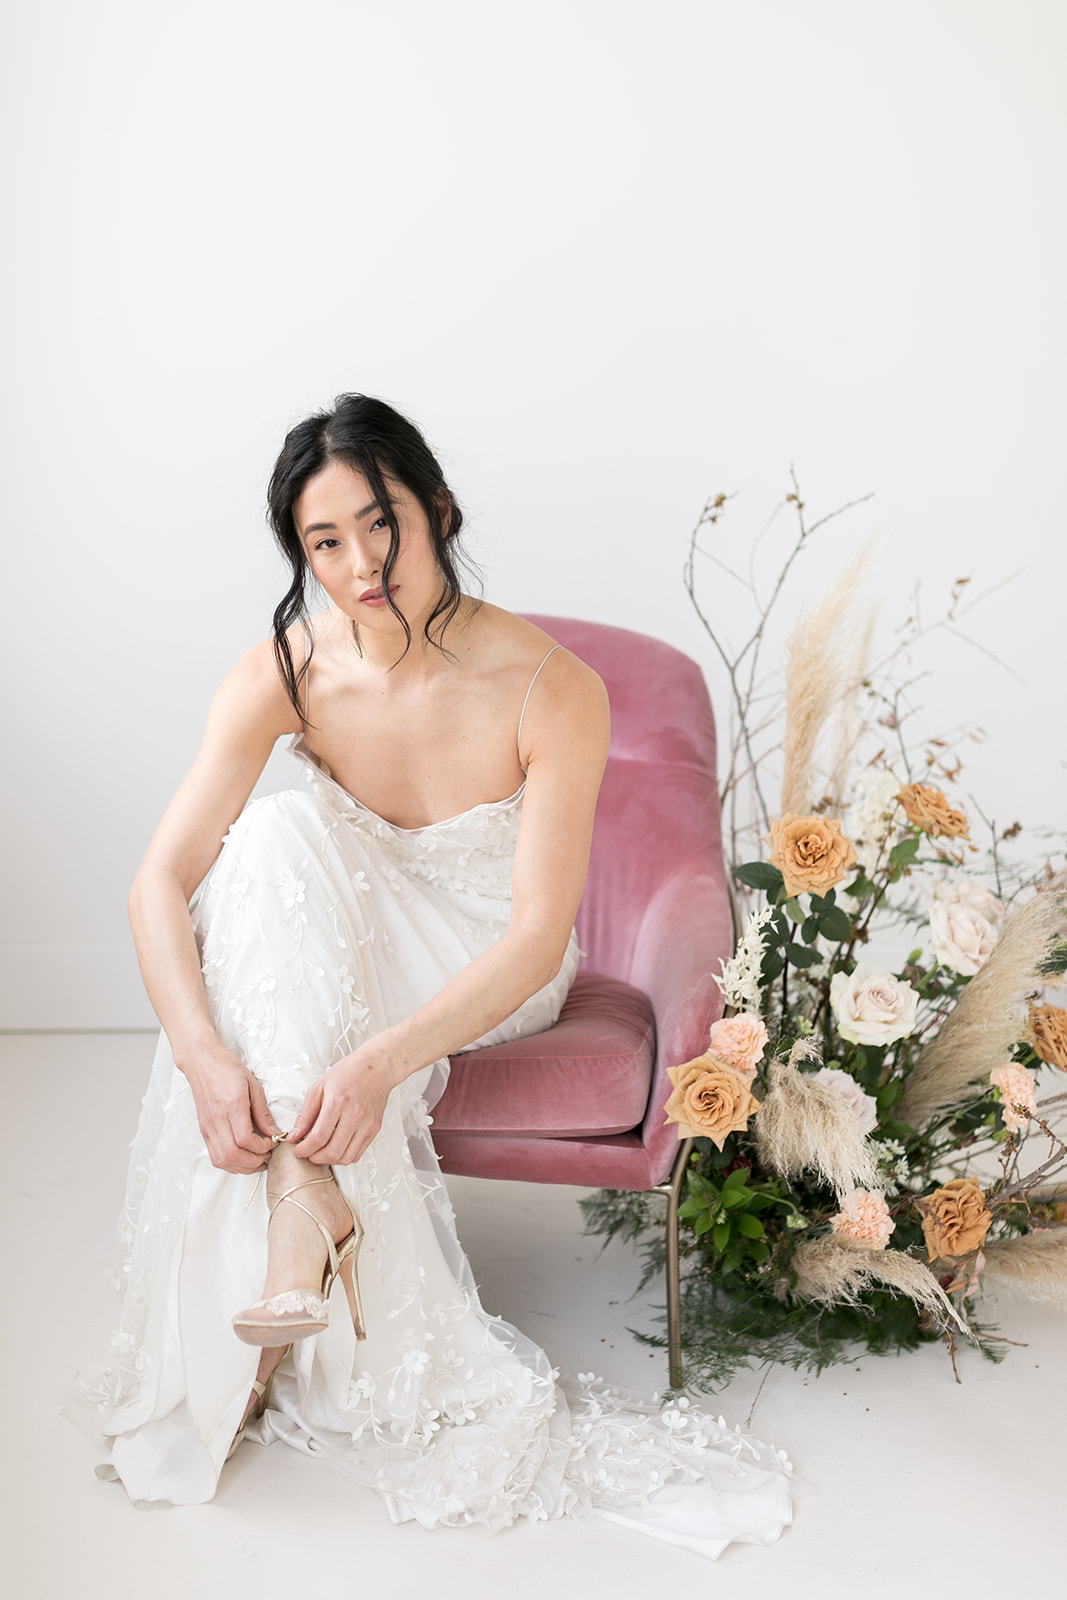 Presses Flowers Styled Shoot - Amy Caroline Photography-1.jpg